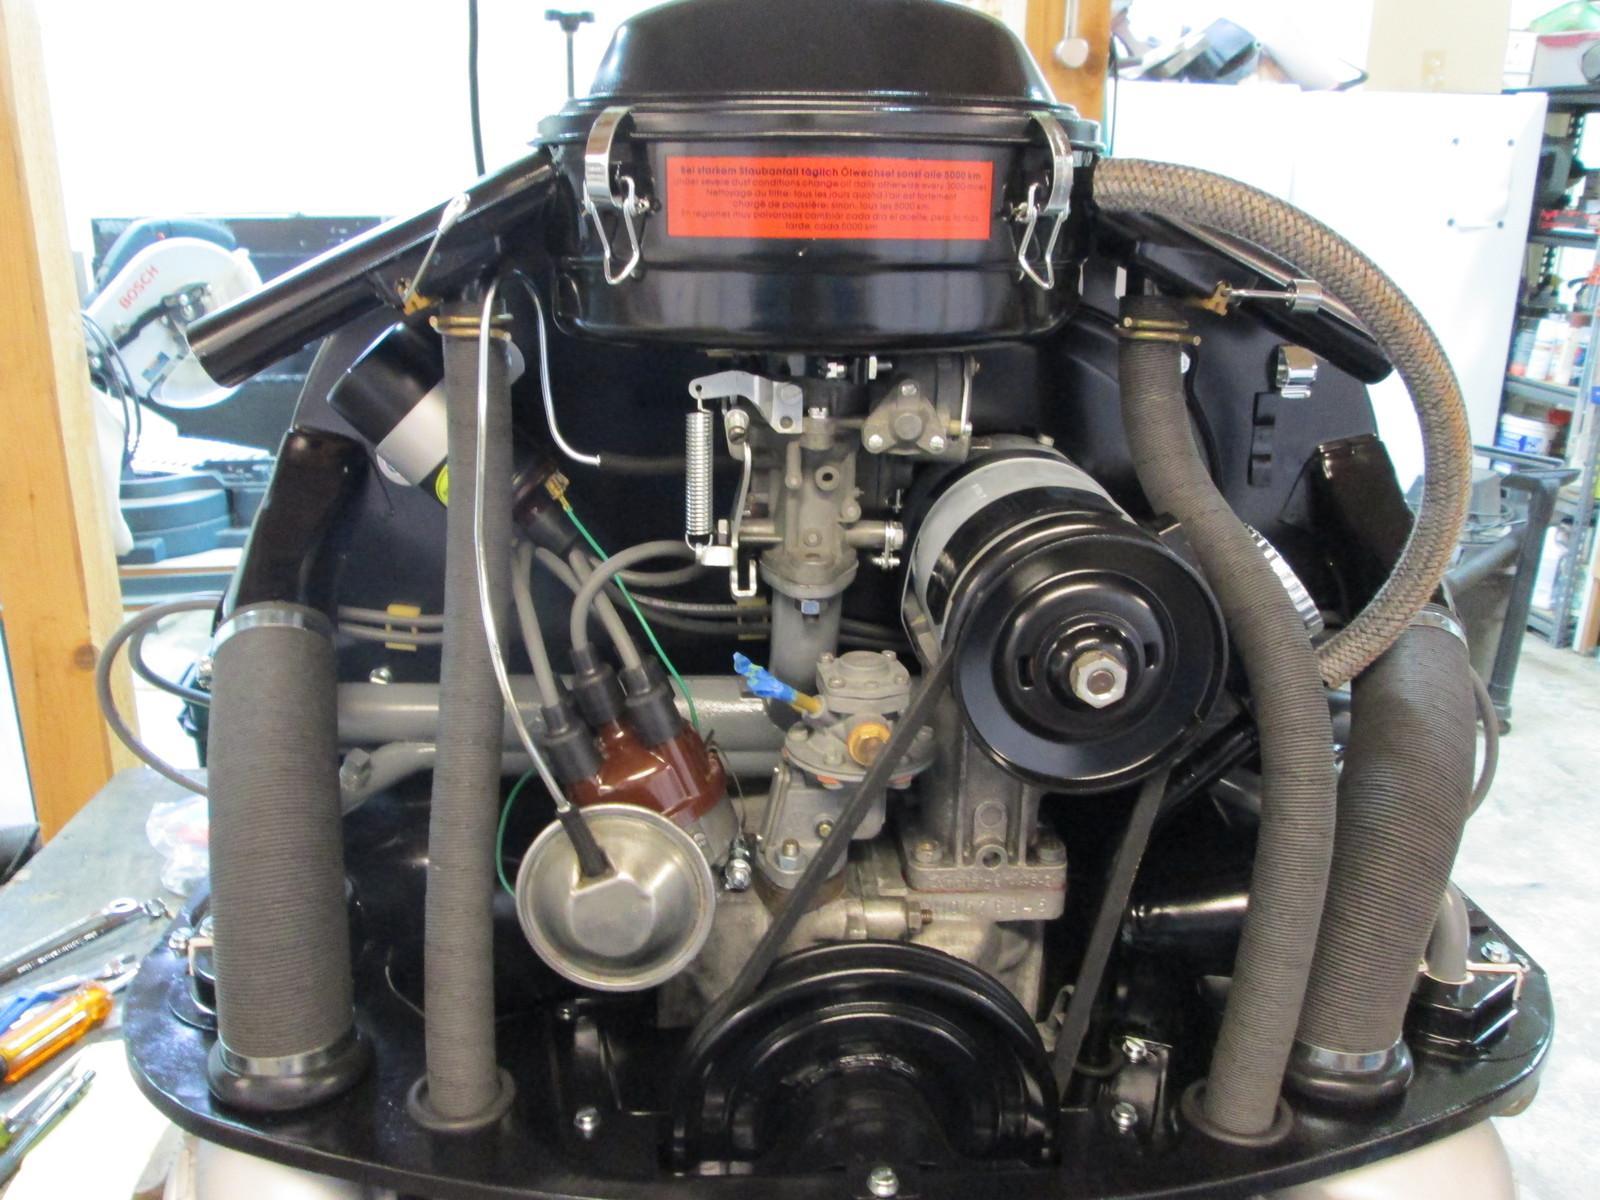 1971 Vw Super Beetle Parts >> Air Cleaner & Pre Heat Hoses   1967 VW Beetle